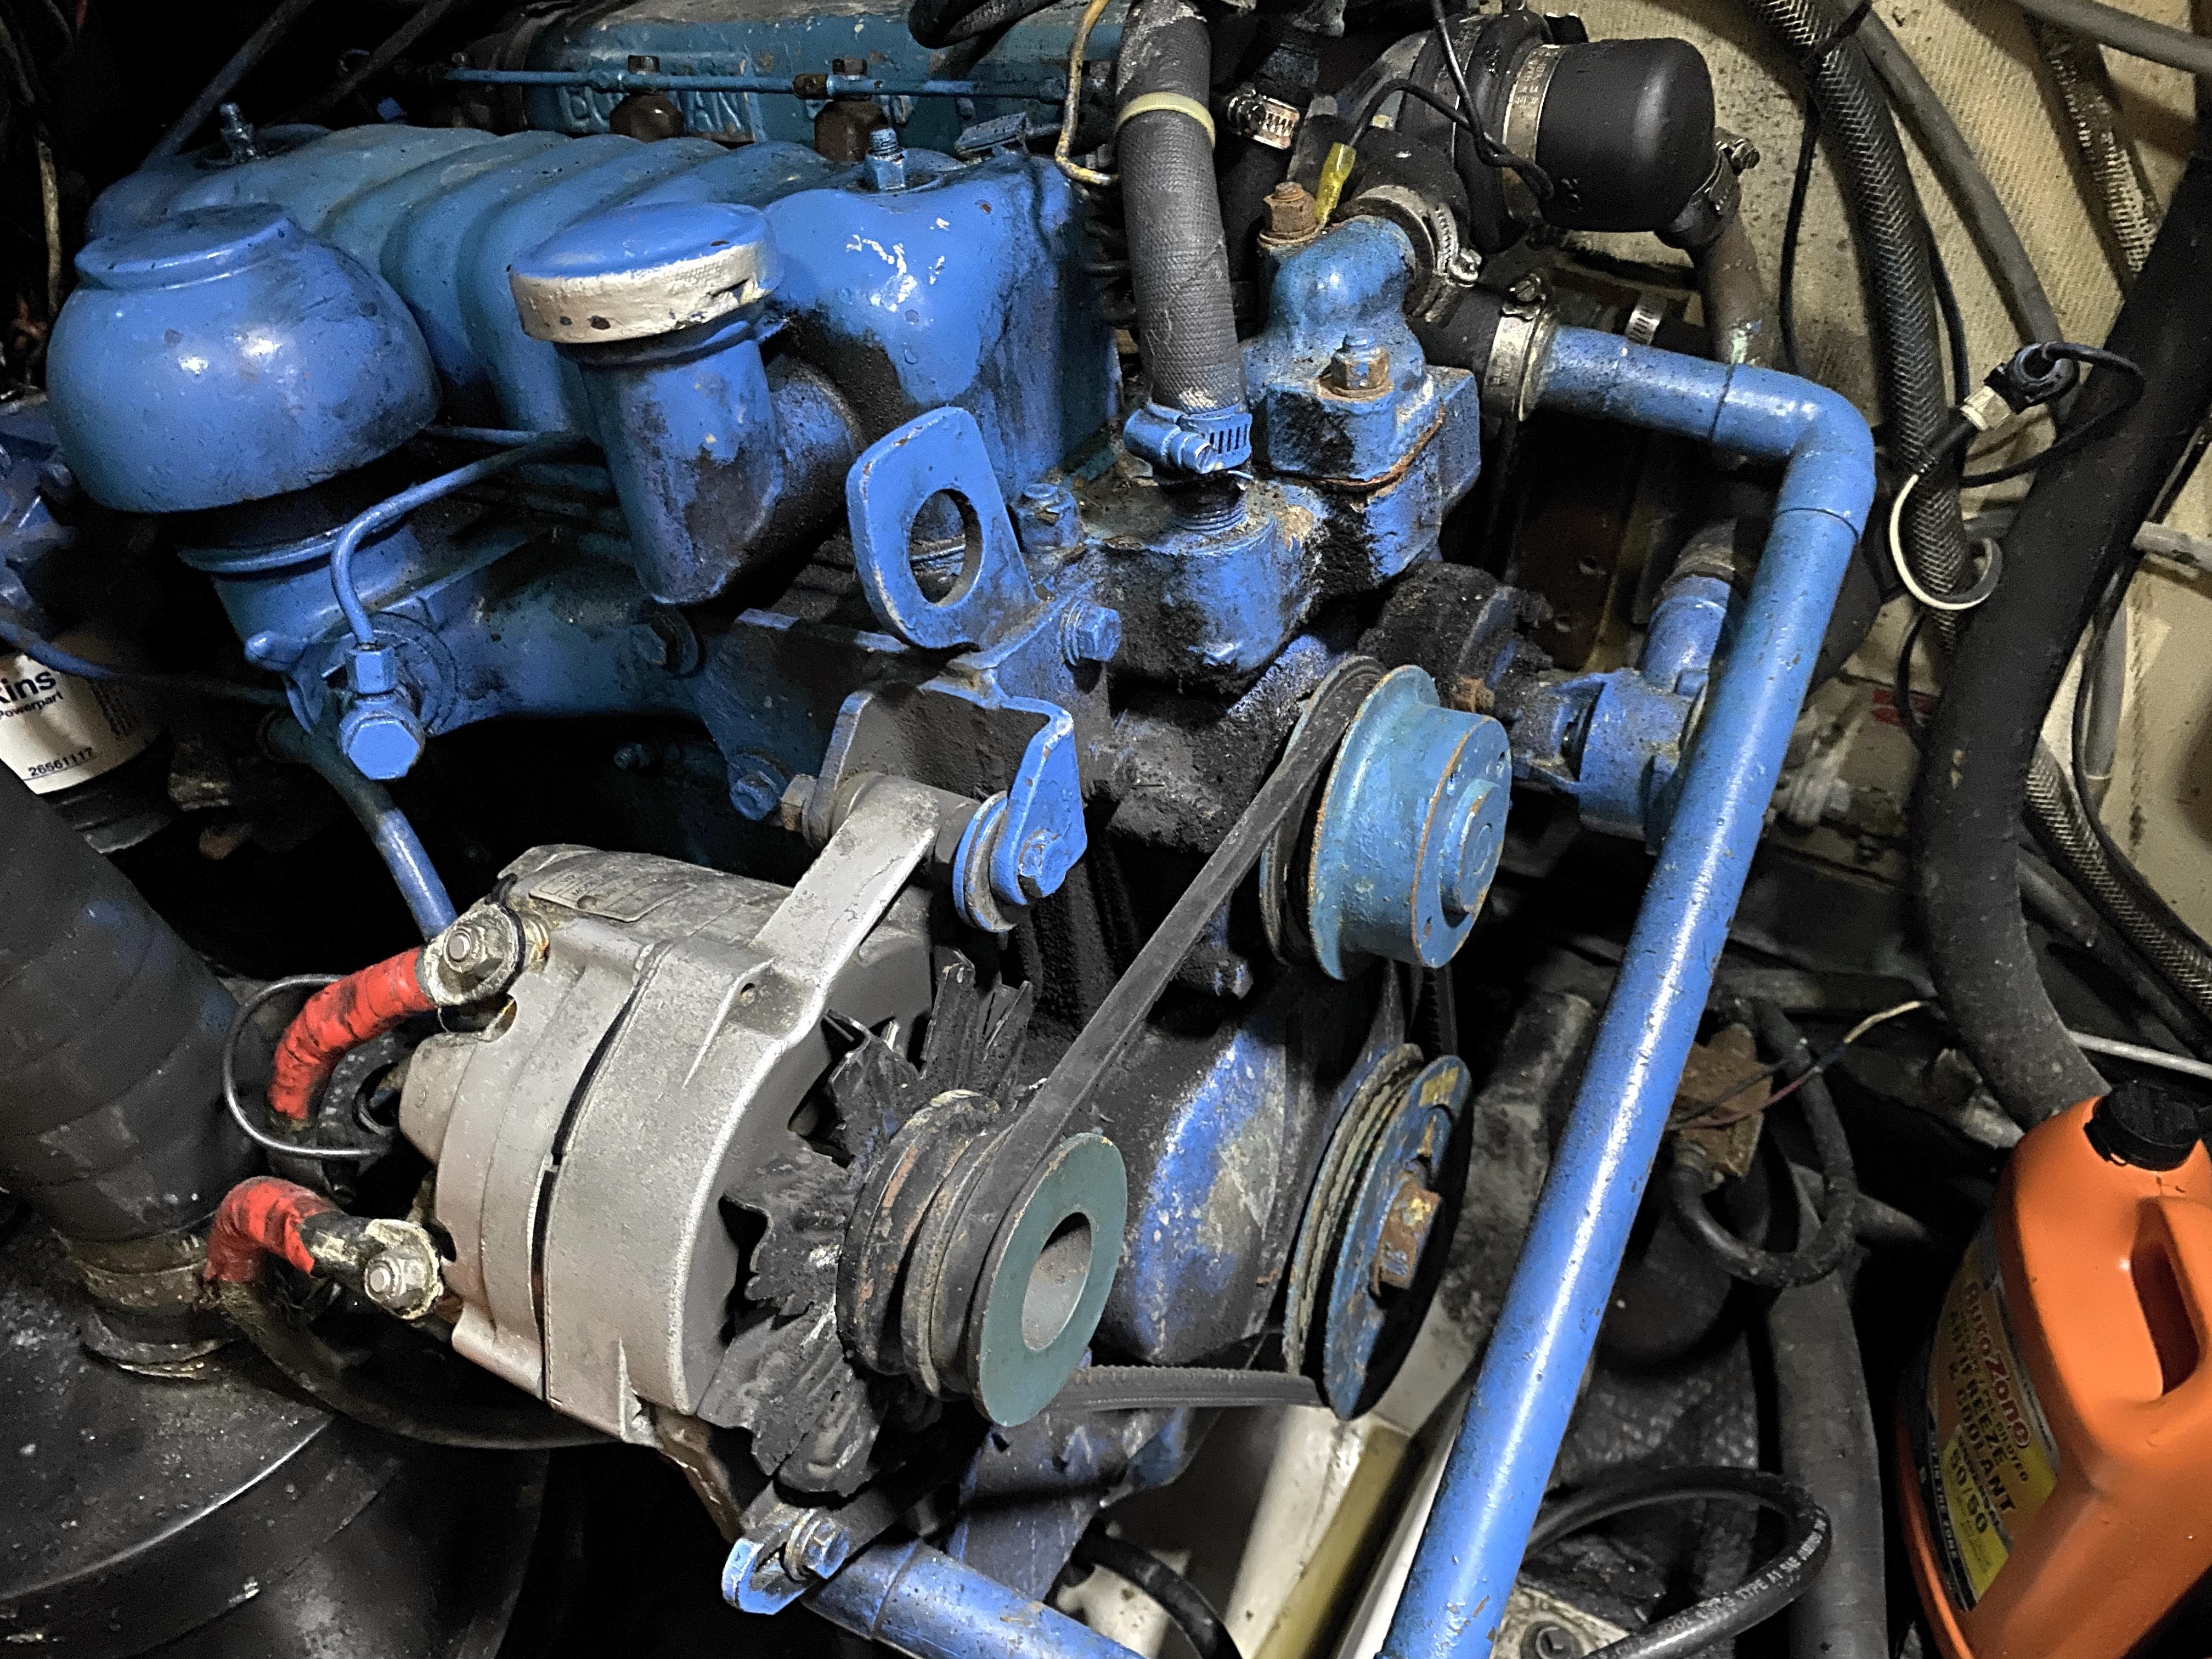 Endeavour 40 Center Cockpit - Perkins 4108 50 HP engine